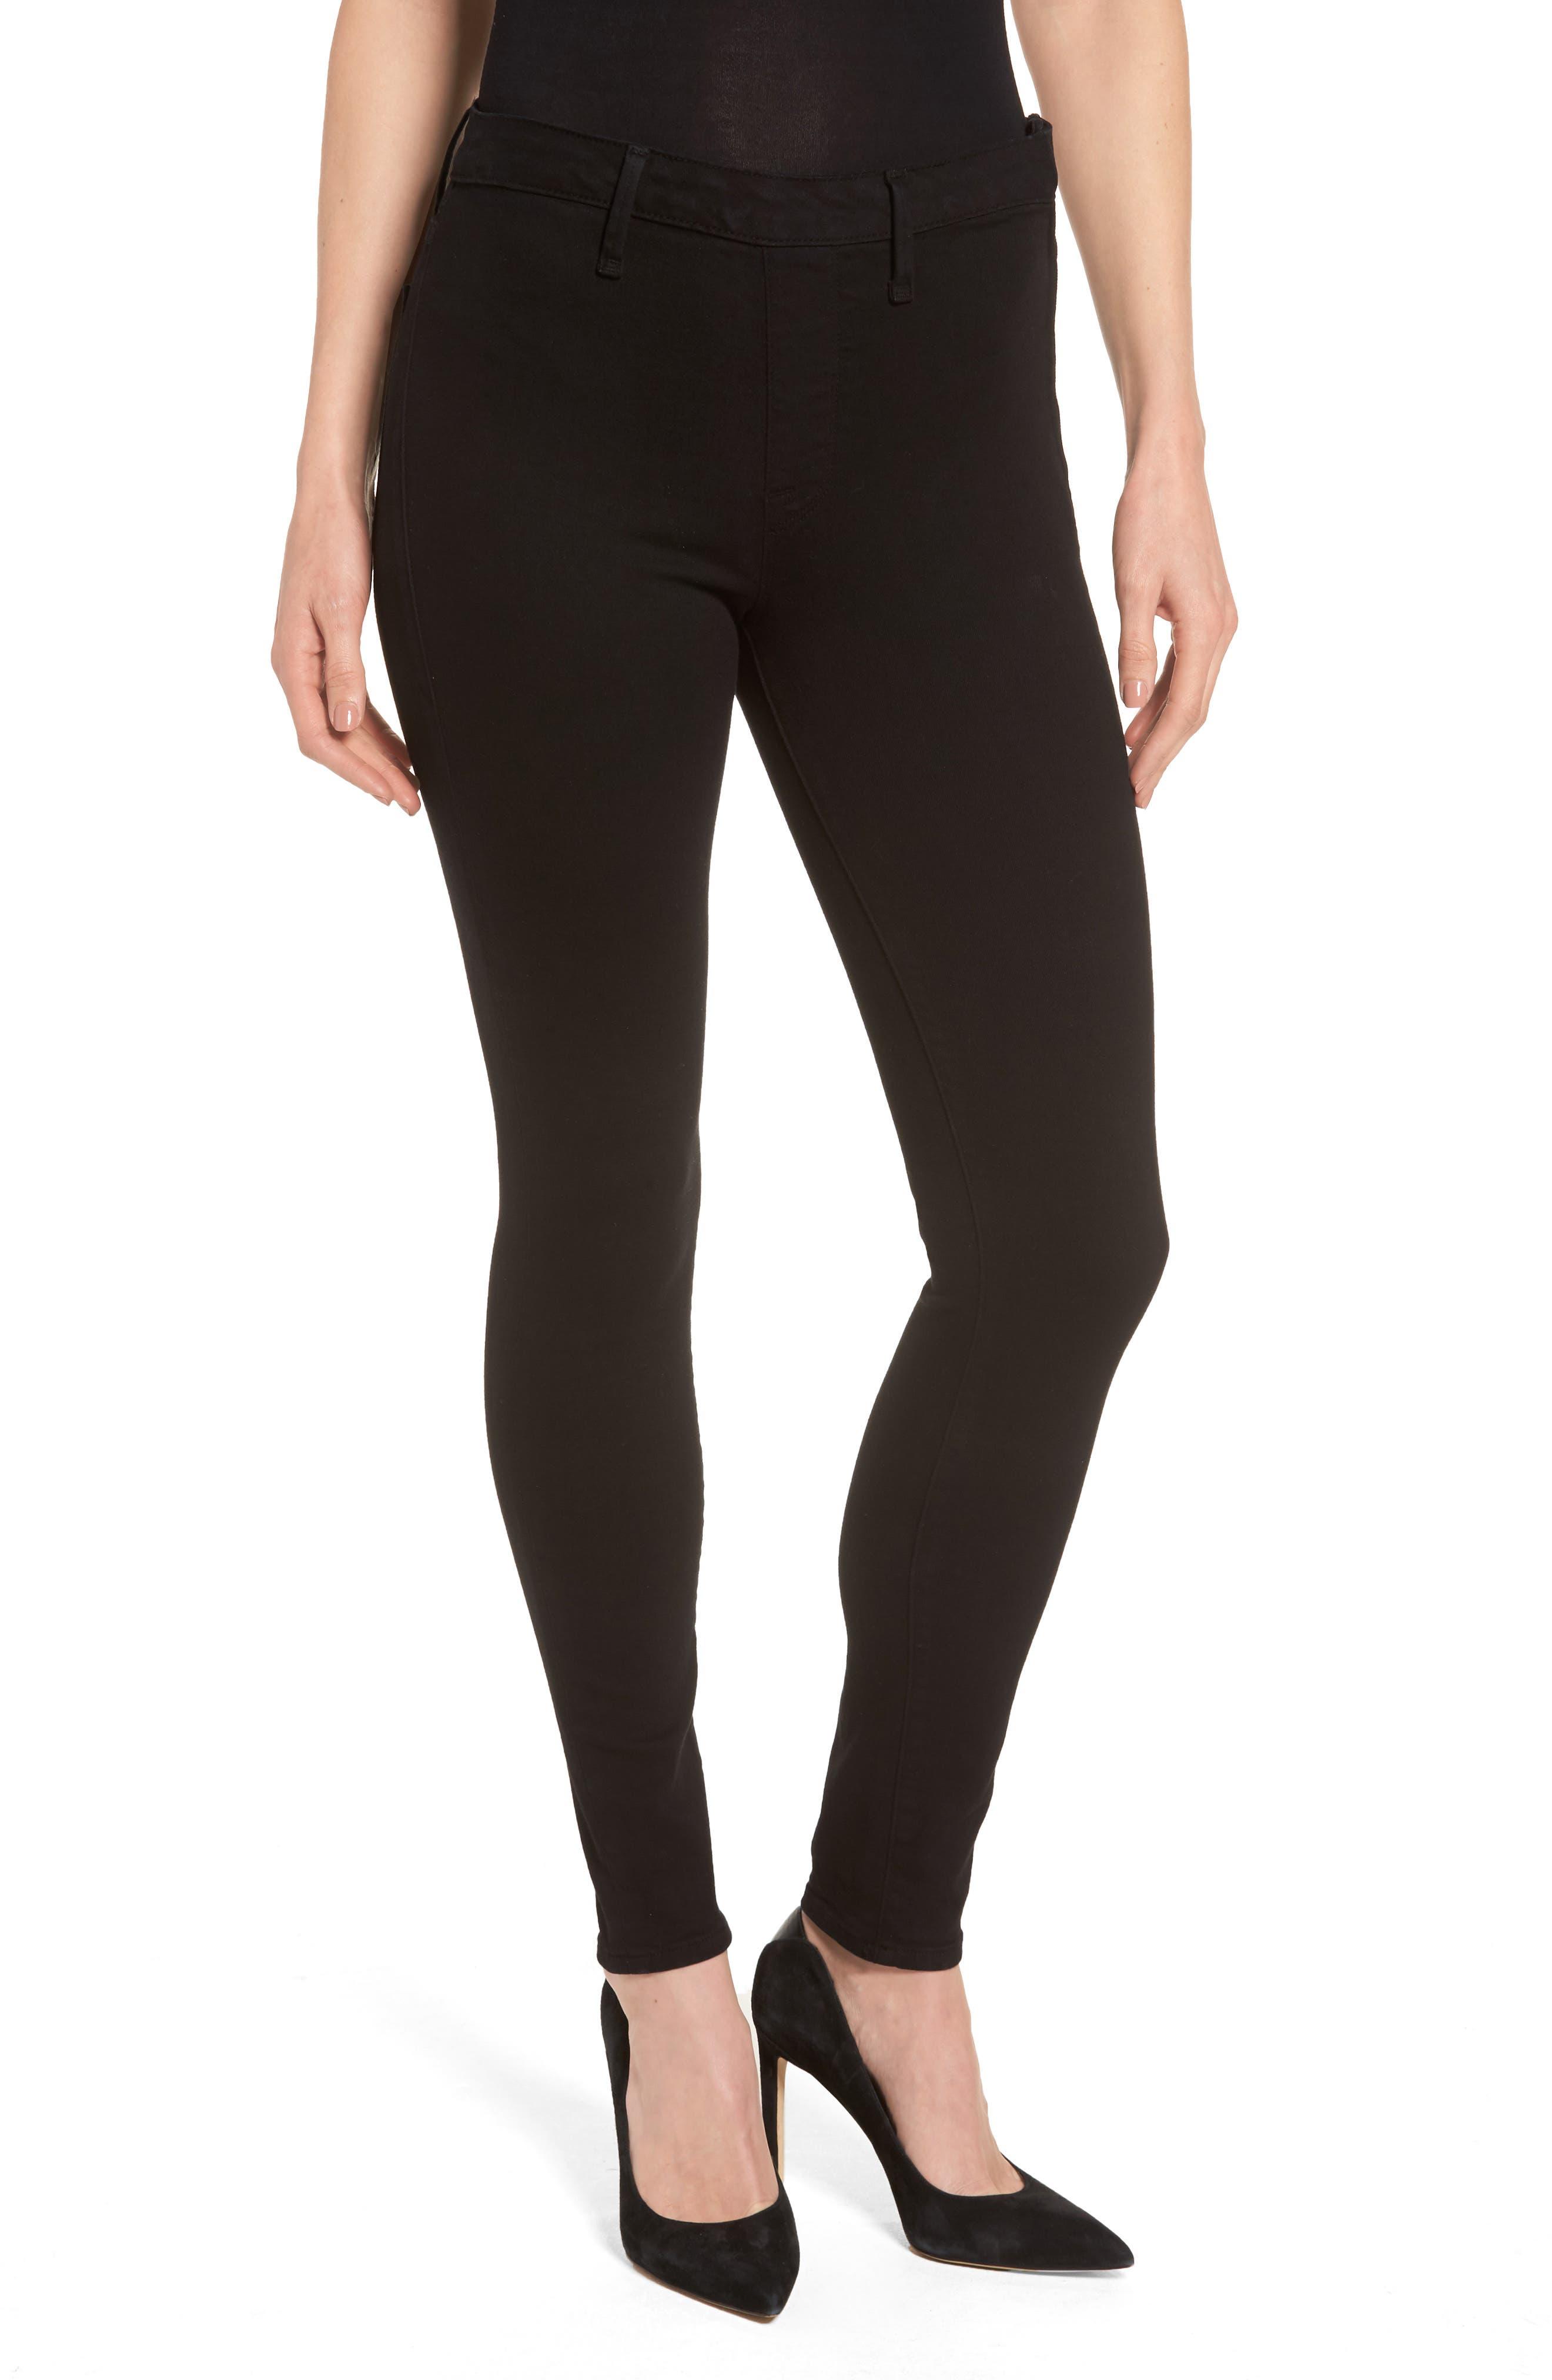 Alternate Image 1 Selected - Good American High Waist Side Zip Skinny Jeans (Black 001) (Extended Sizes)